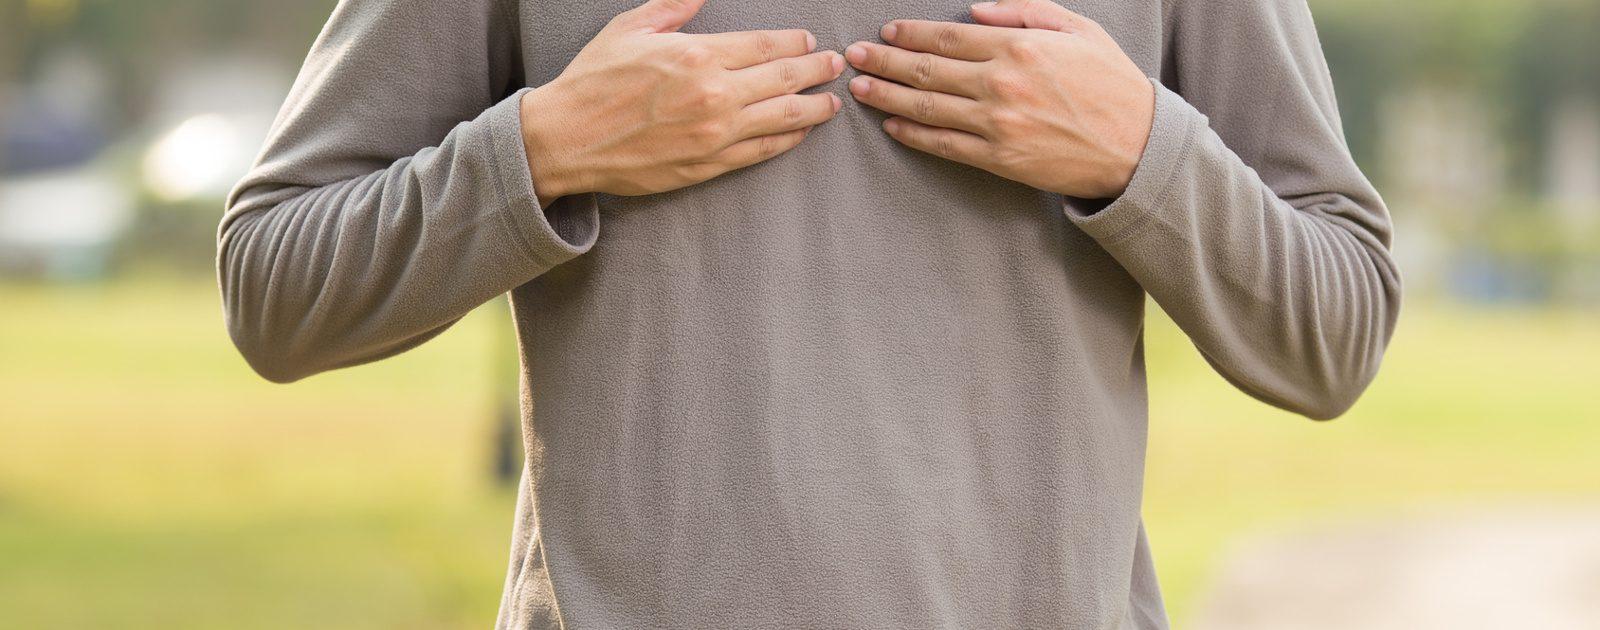 Mann fasst sich an die Brust